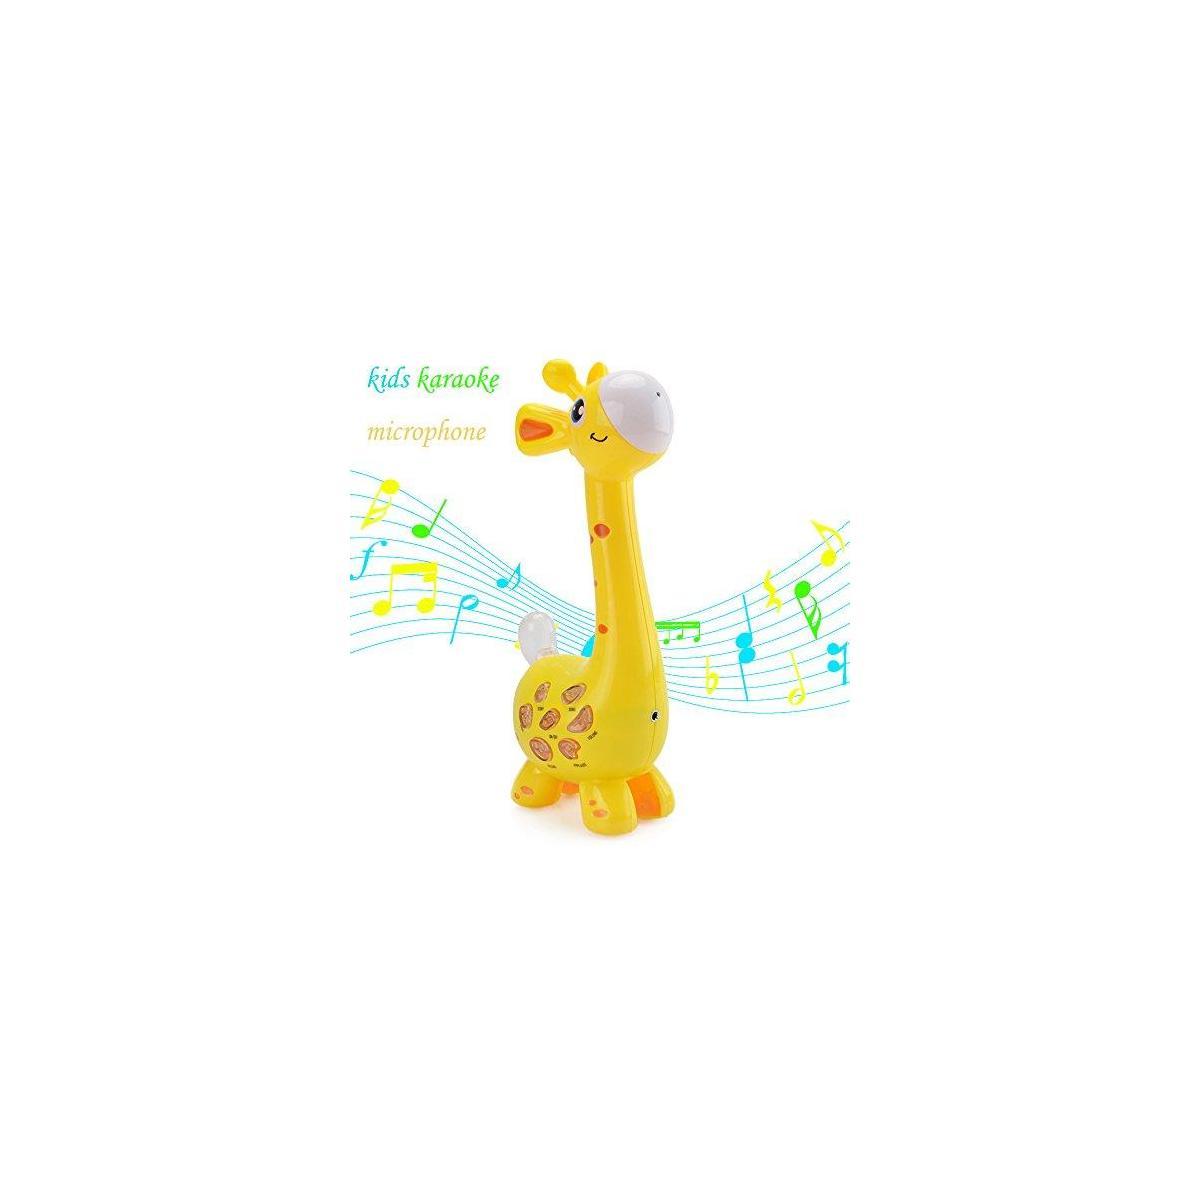 Happytime Kids Karaoke Microphone Musial Toys 2019 Cool Giraffe Design Birthday Gifts Intelligence Development Toys for 18 Months up Children